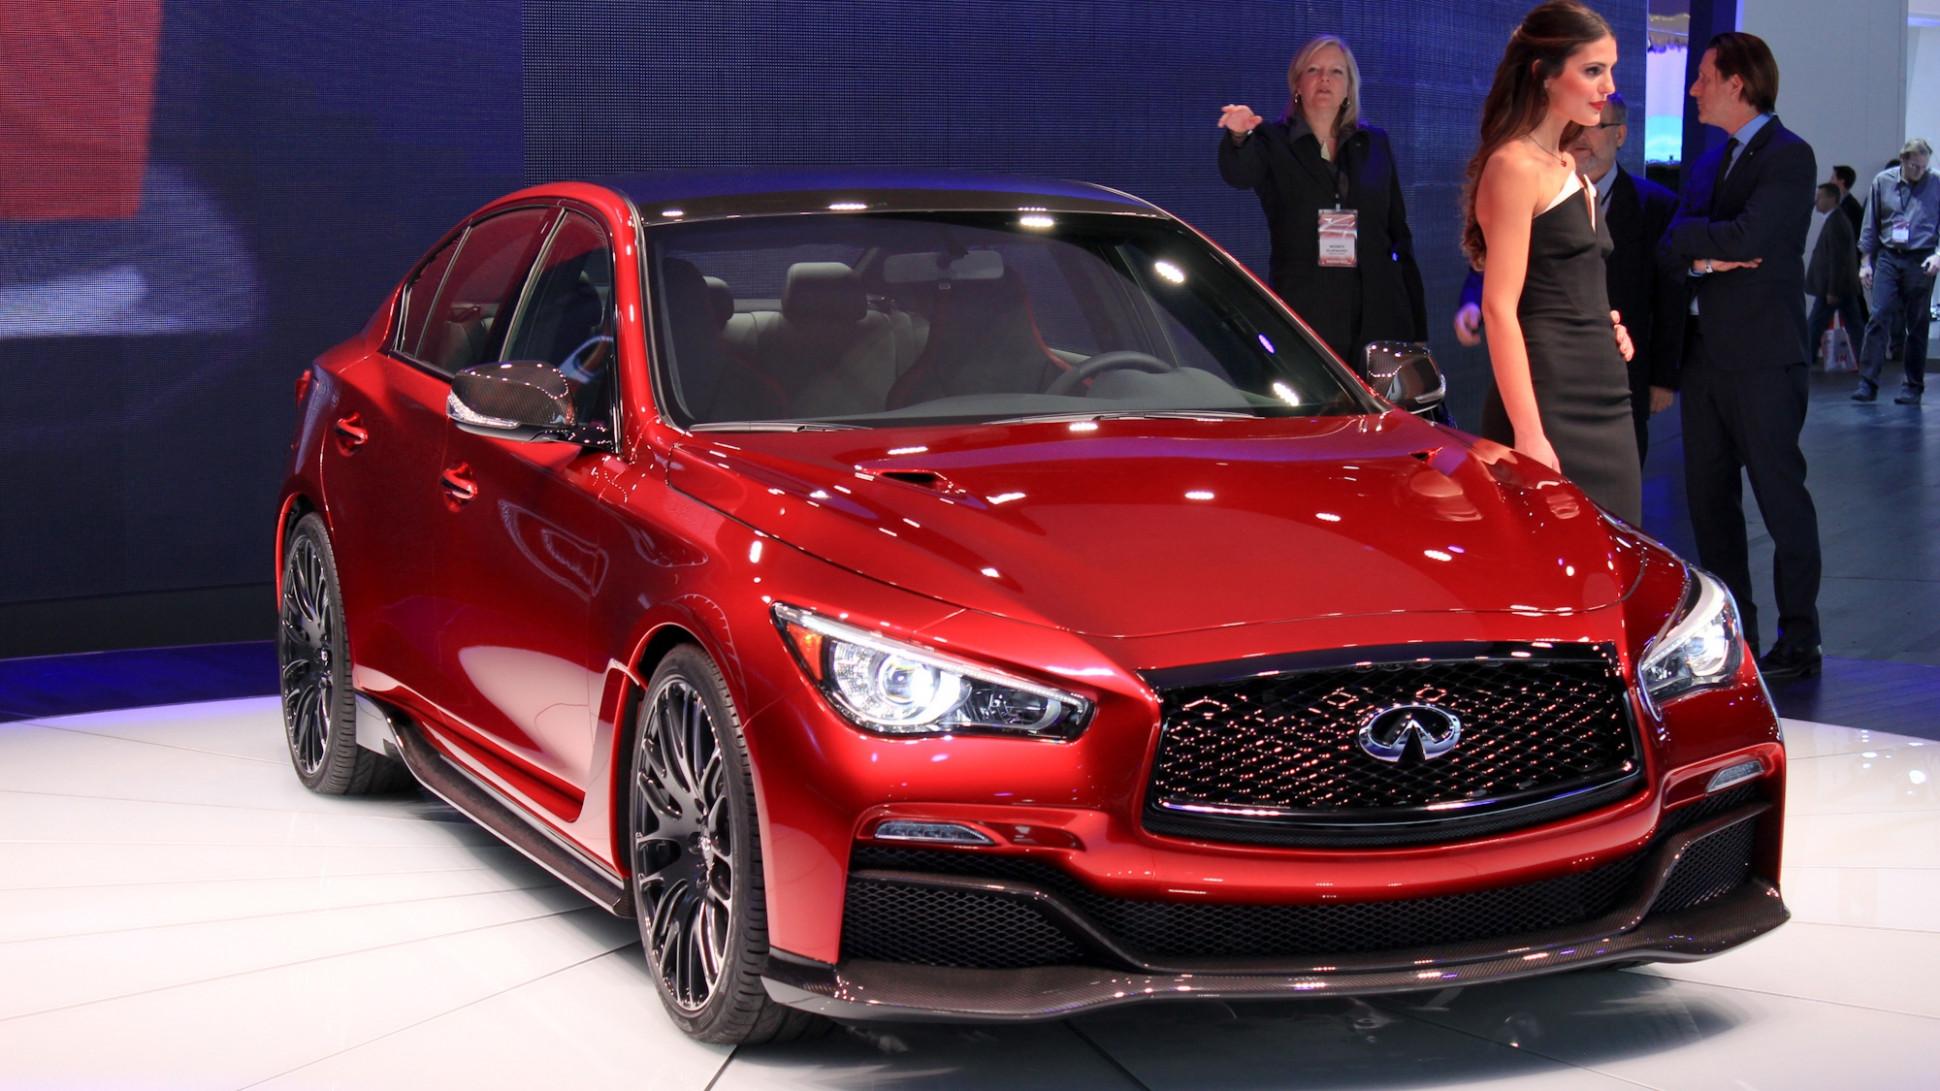 Spesification 2022 Infiniti Q50 Coupe Eau Rouge